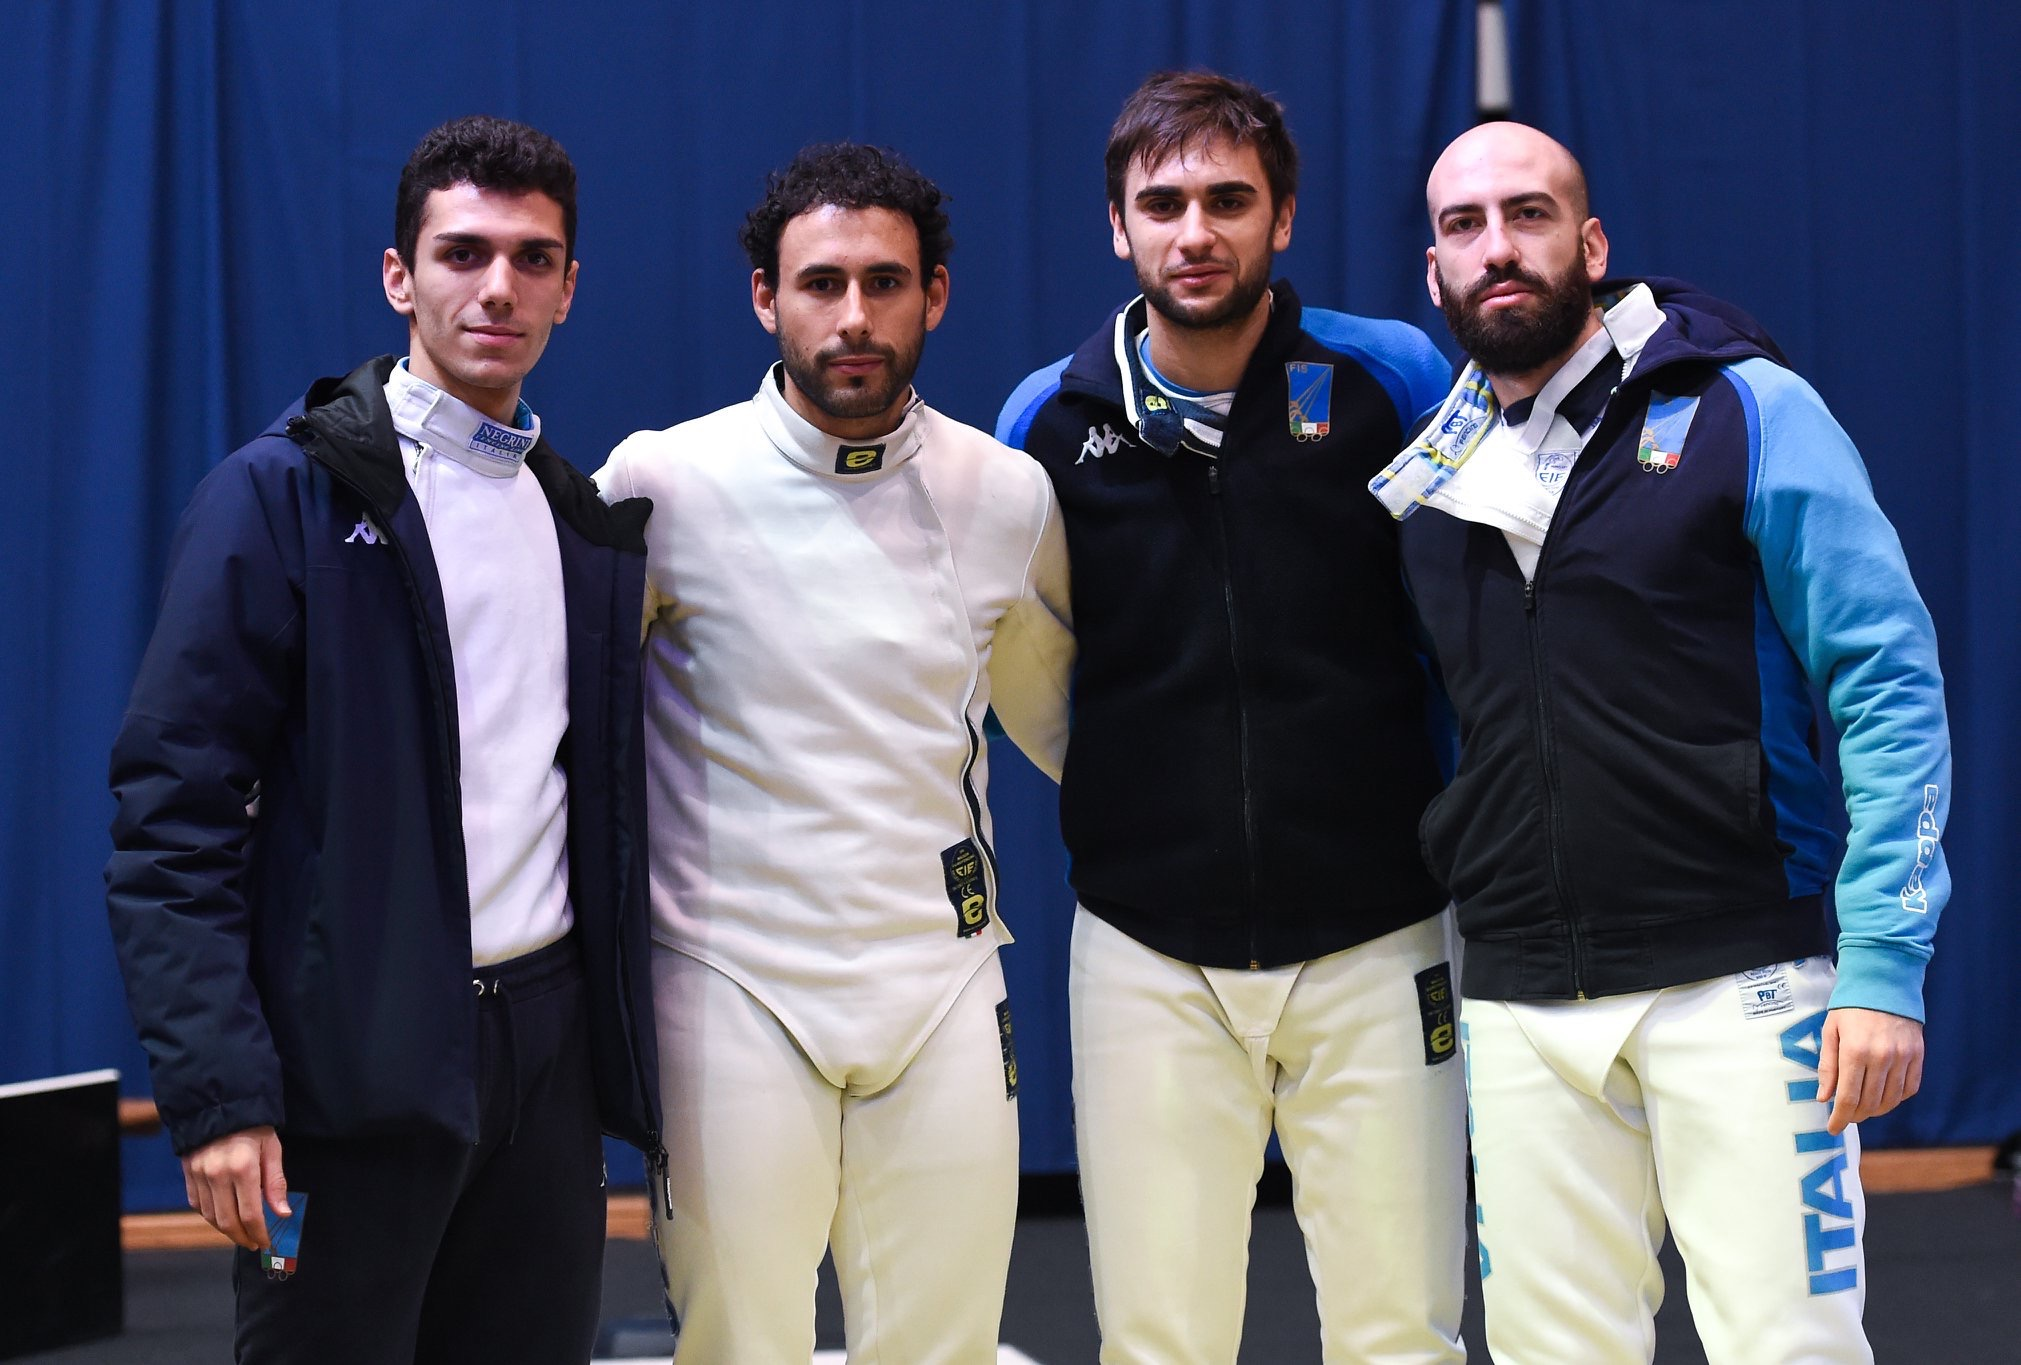 squadra Italia scherma